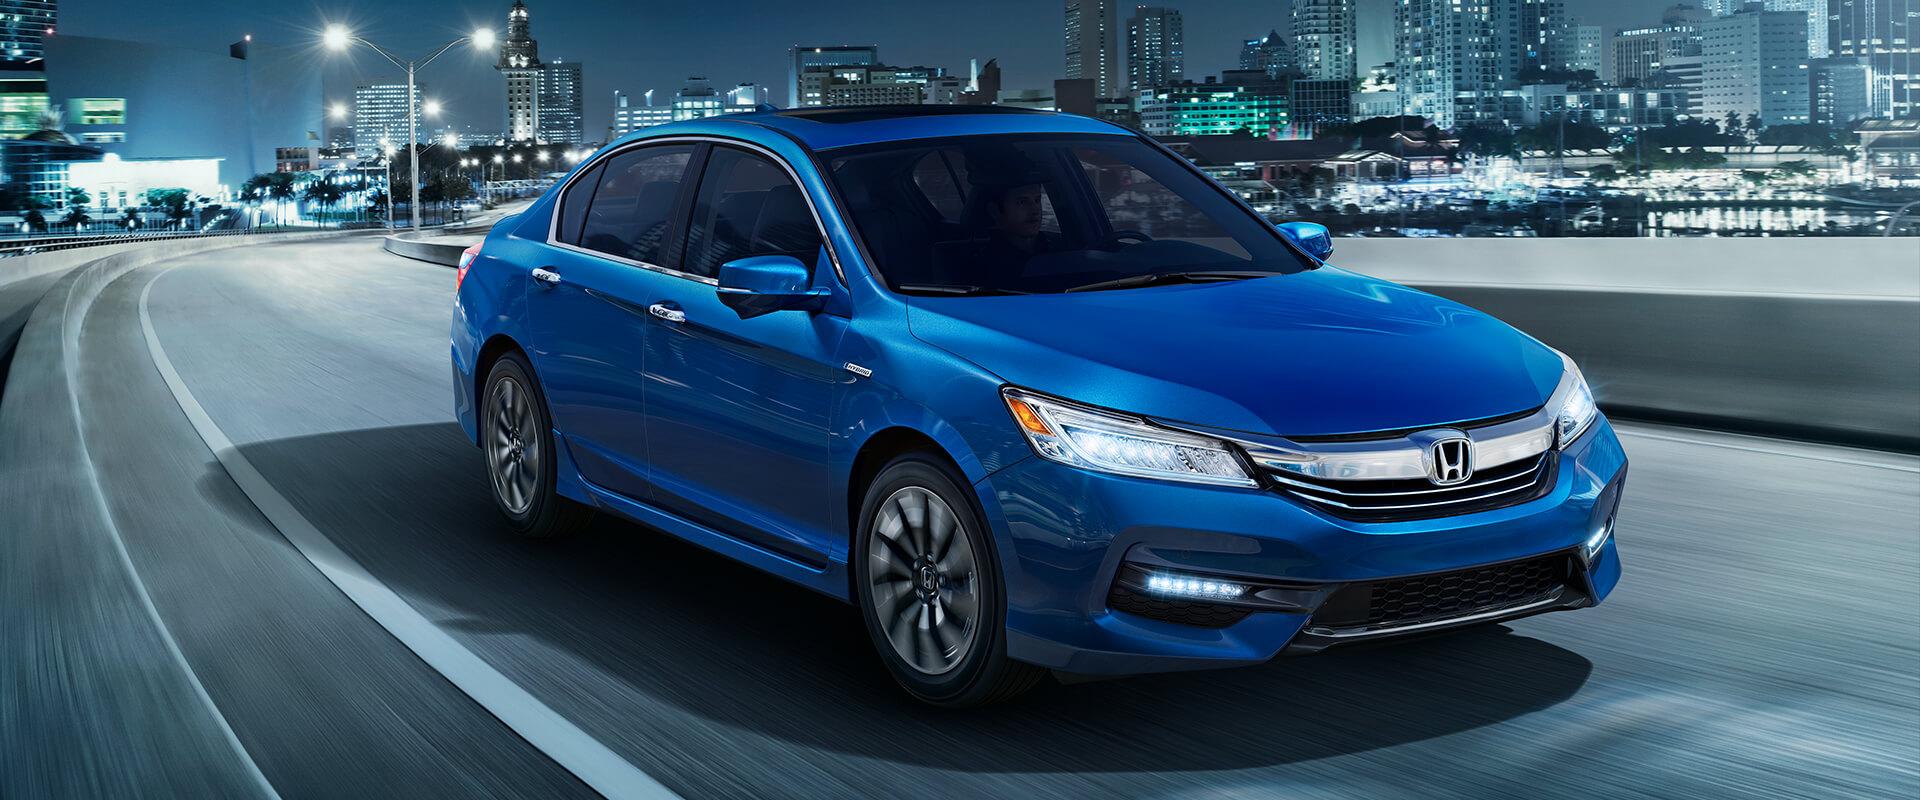 2017 honda accord hybrid central alabama honda dealers for Honda dealerships in alabama